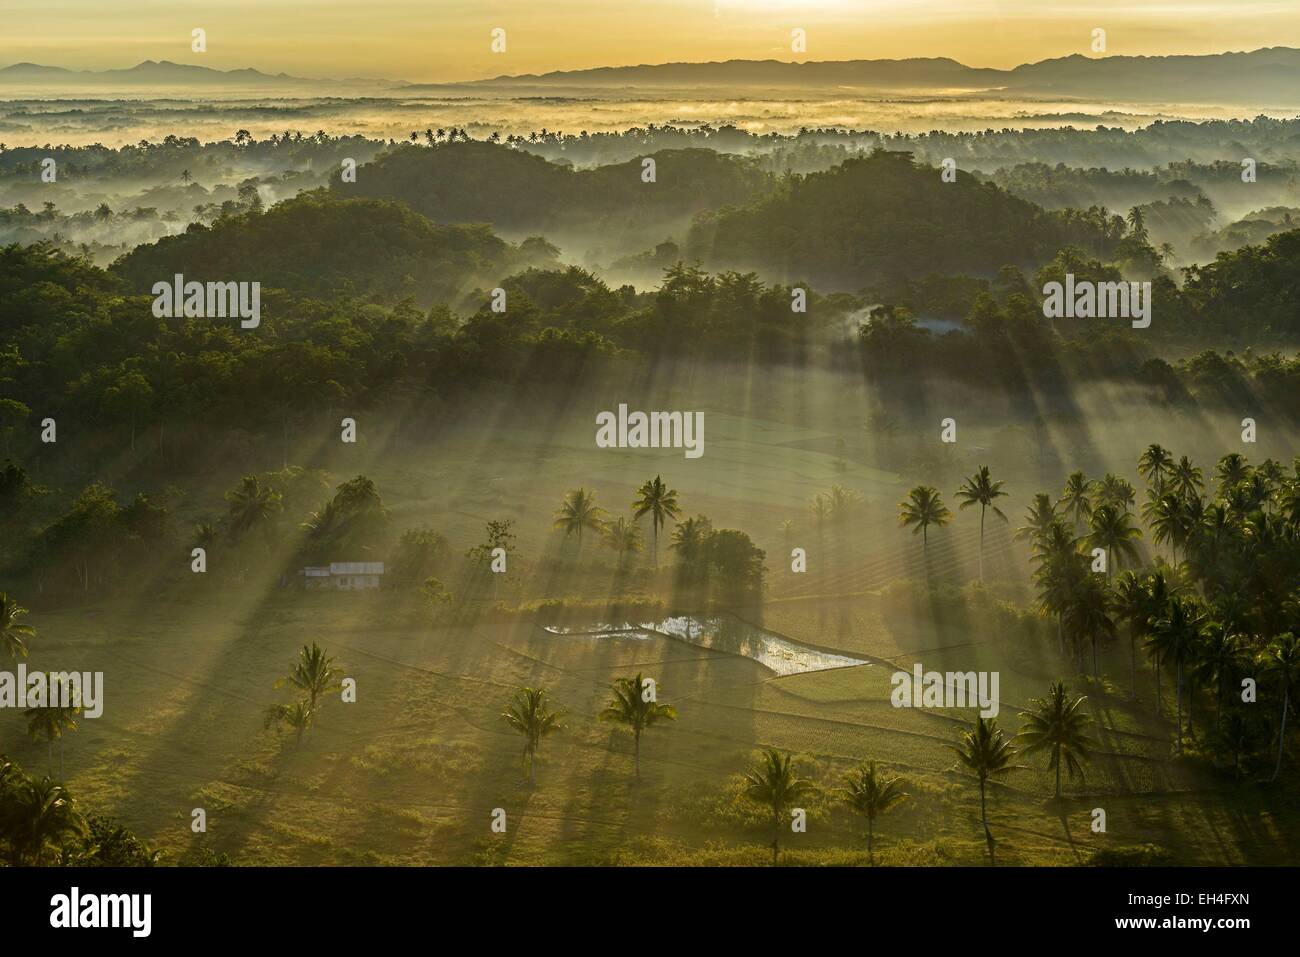 Philippinen, Visayas-Archipel, Bohol Island, Carmen Bereich, Reisfeld in die Chocolate Hills bei Sonnenaufgang Stockbild